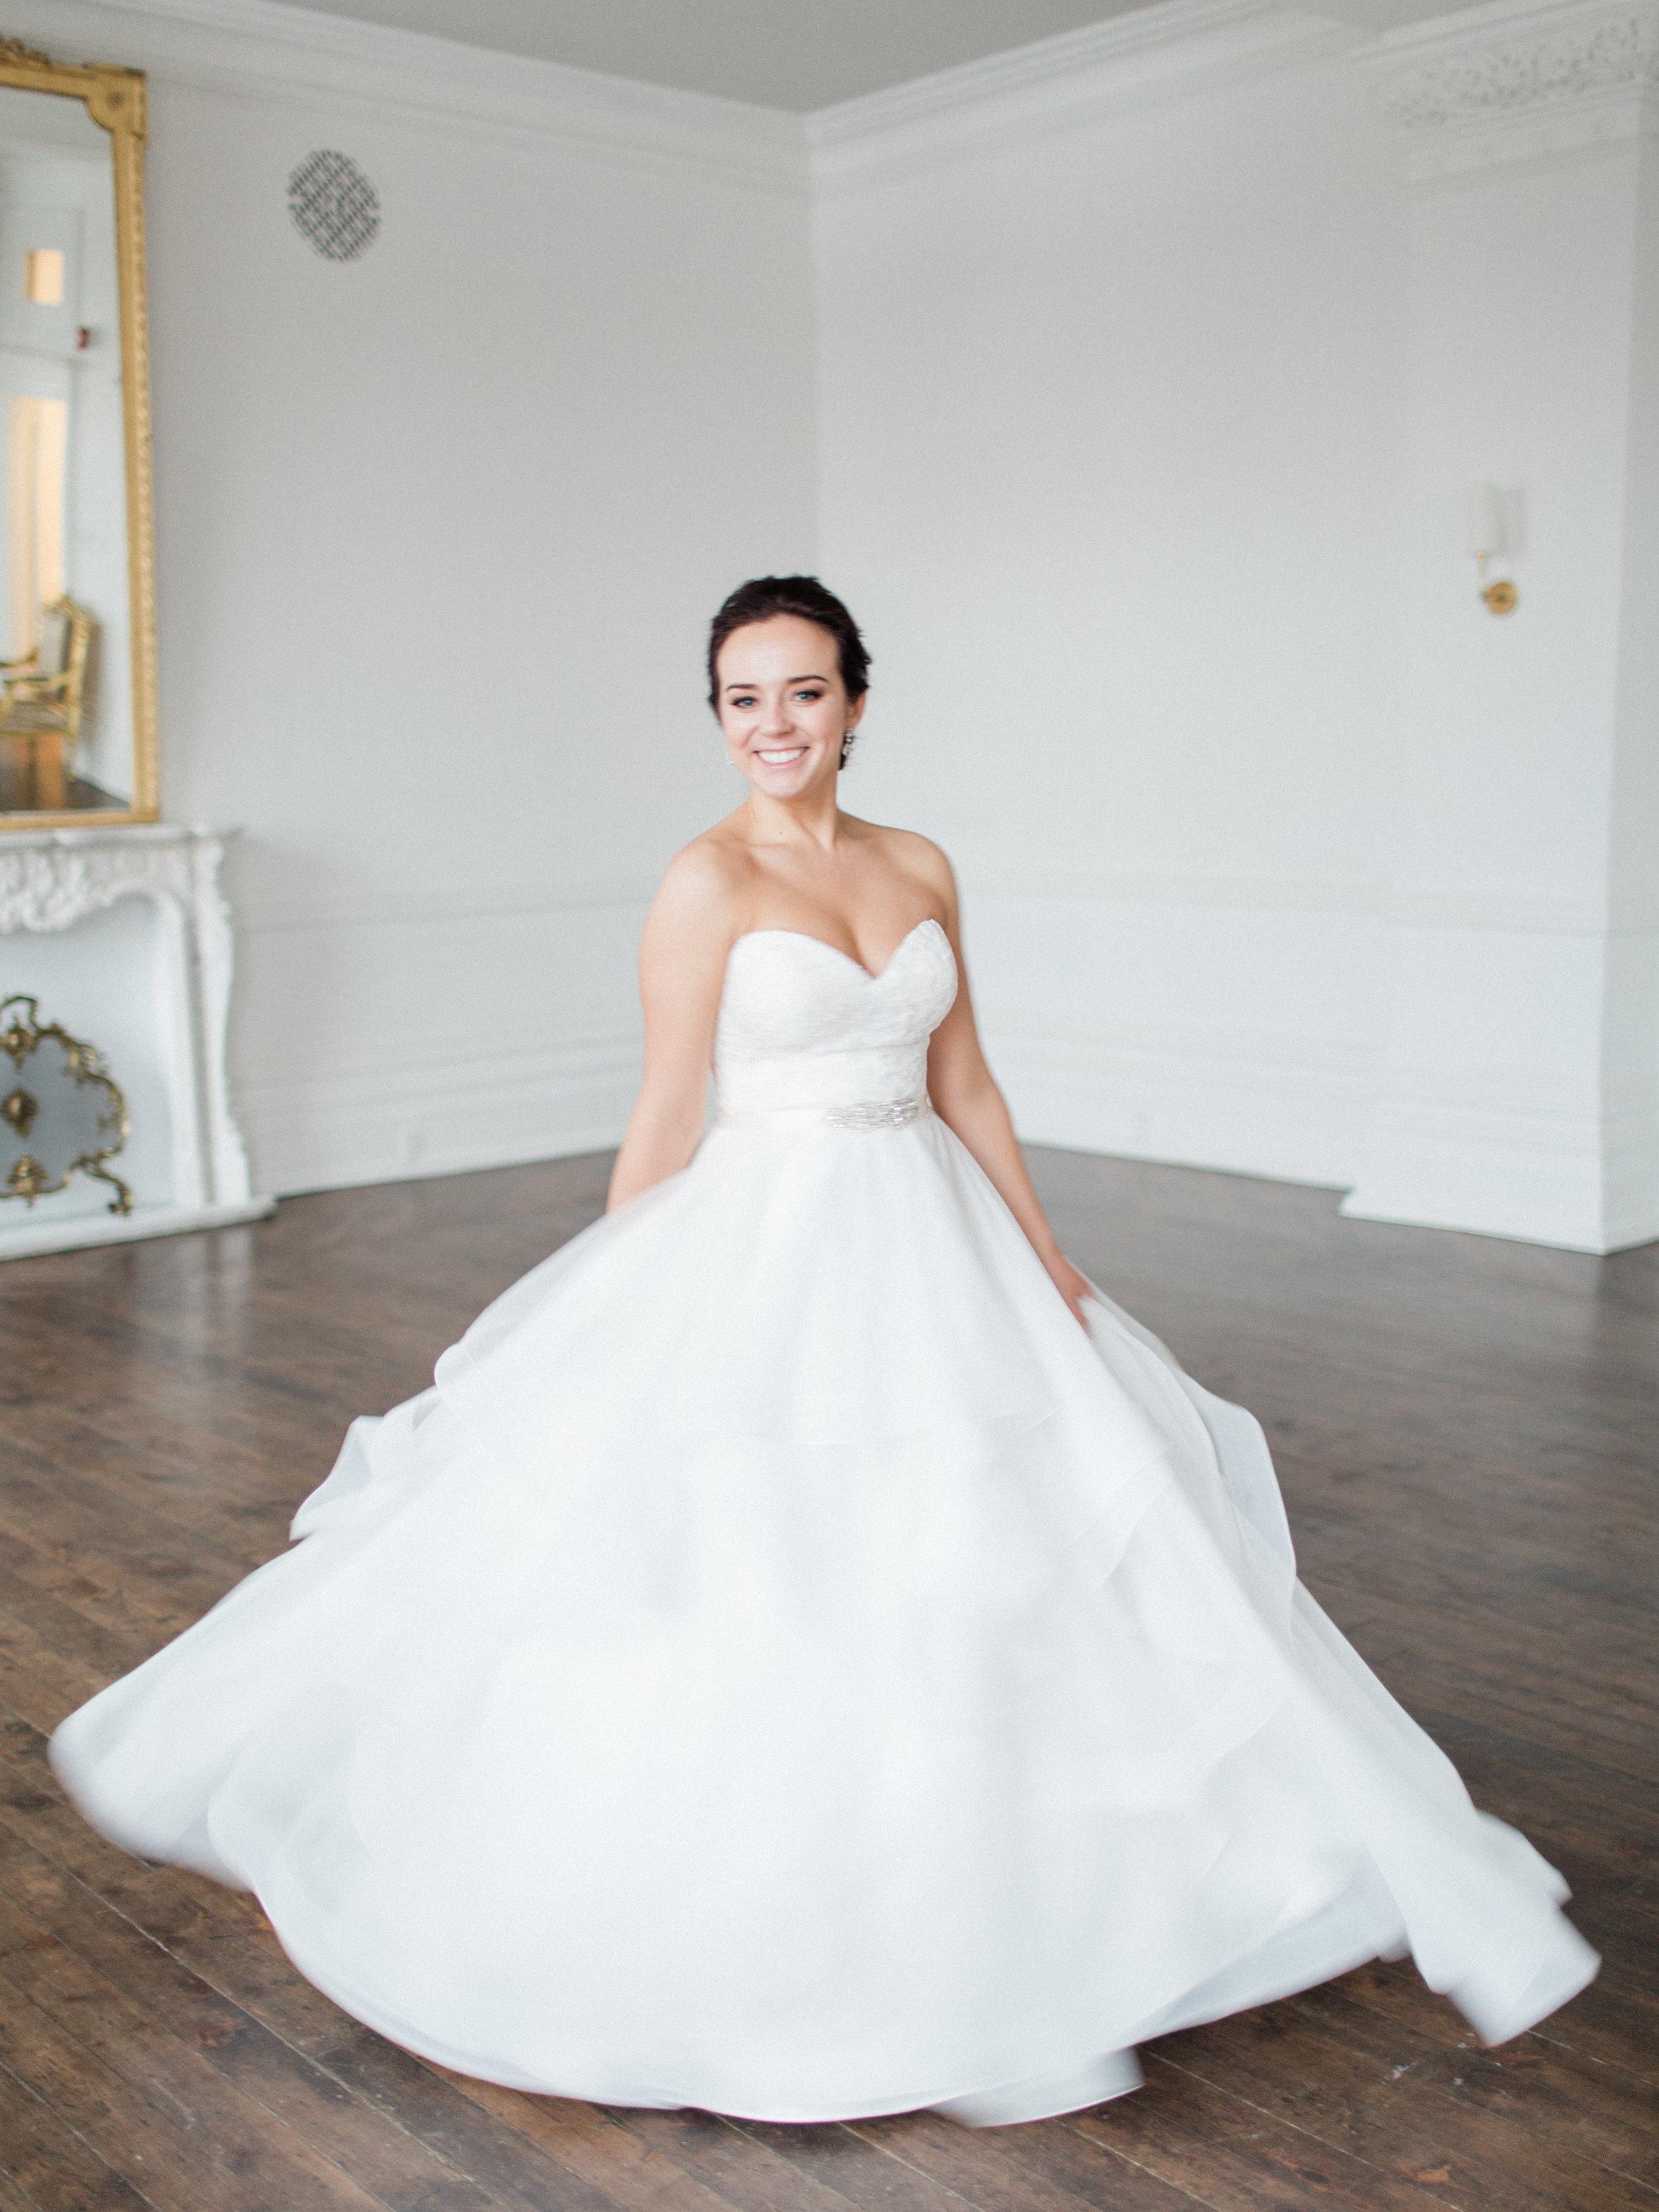 Toronto-Collingwood-Muskoka-Wedding-photographer-planning-tips-for-your-winter-wedding2.jpg